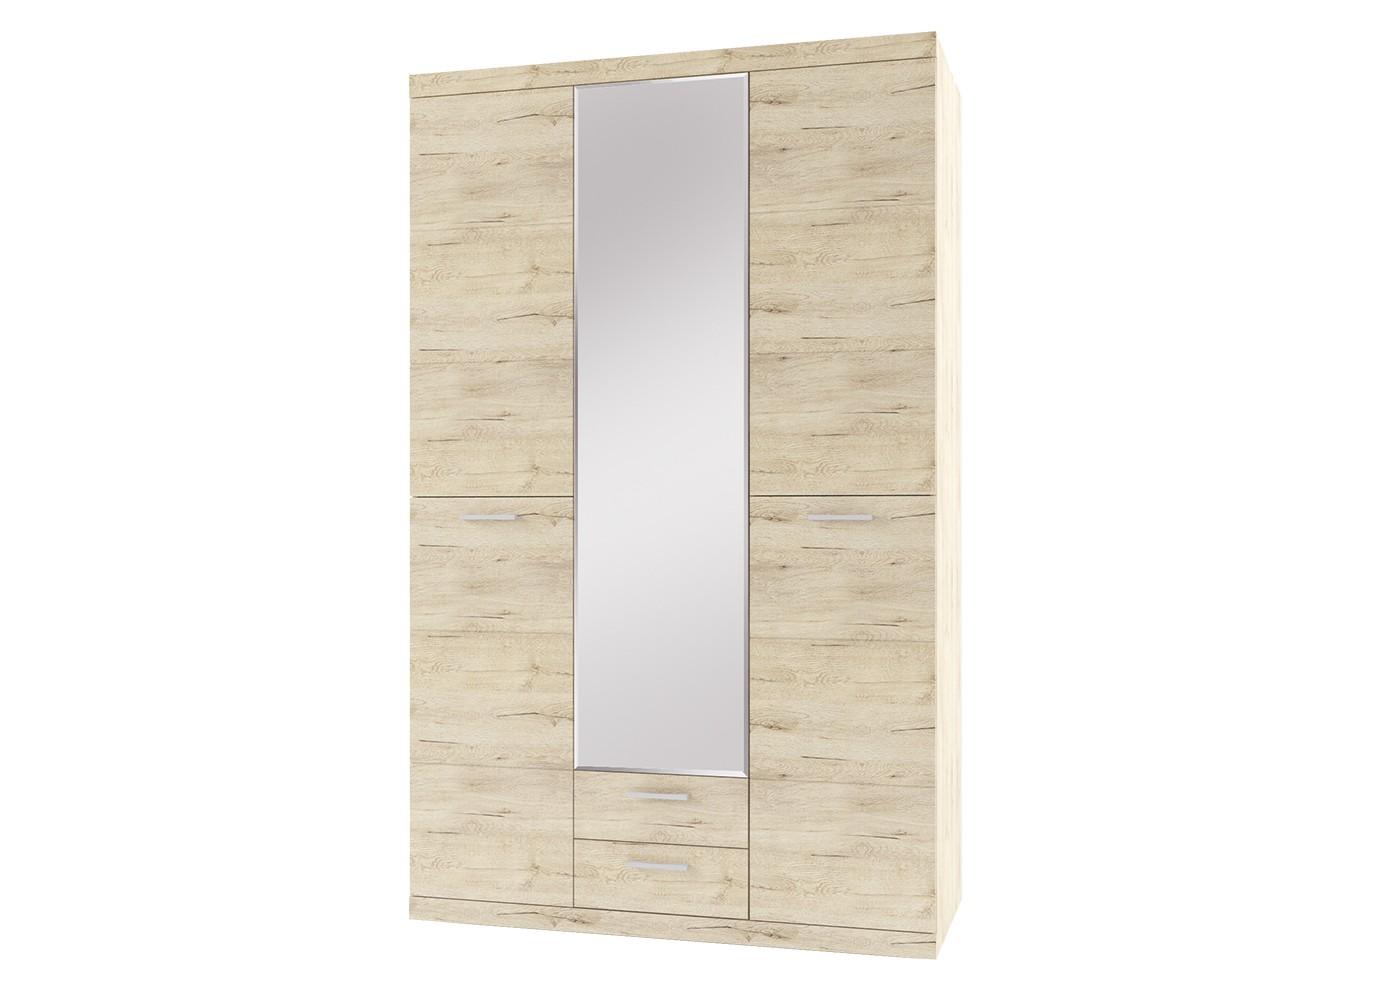 Шкаф OscarБельевые шкафы<br><br><br>Material: ДСП<br>Ширина см: 135<br>Высота см: 217<br>Глубина см: 57